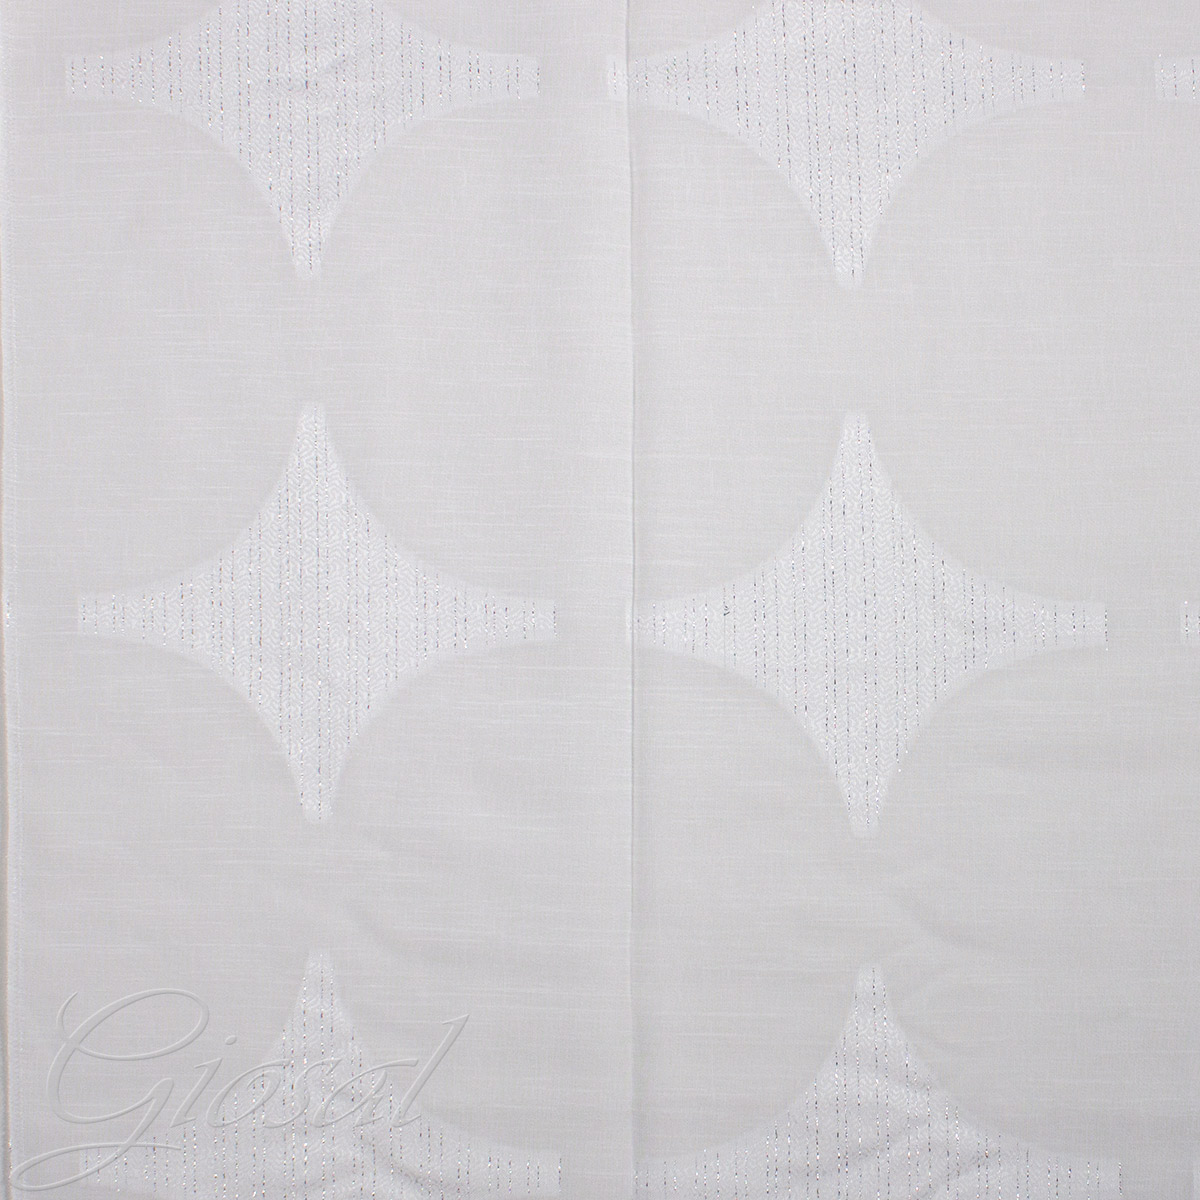 Tessuto-Per-Tenda-Cindy-Bianco-Al-Metro-Arredo-Tendaggi-Telo-Tenda-GIOSAL miniatura 3